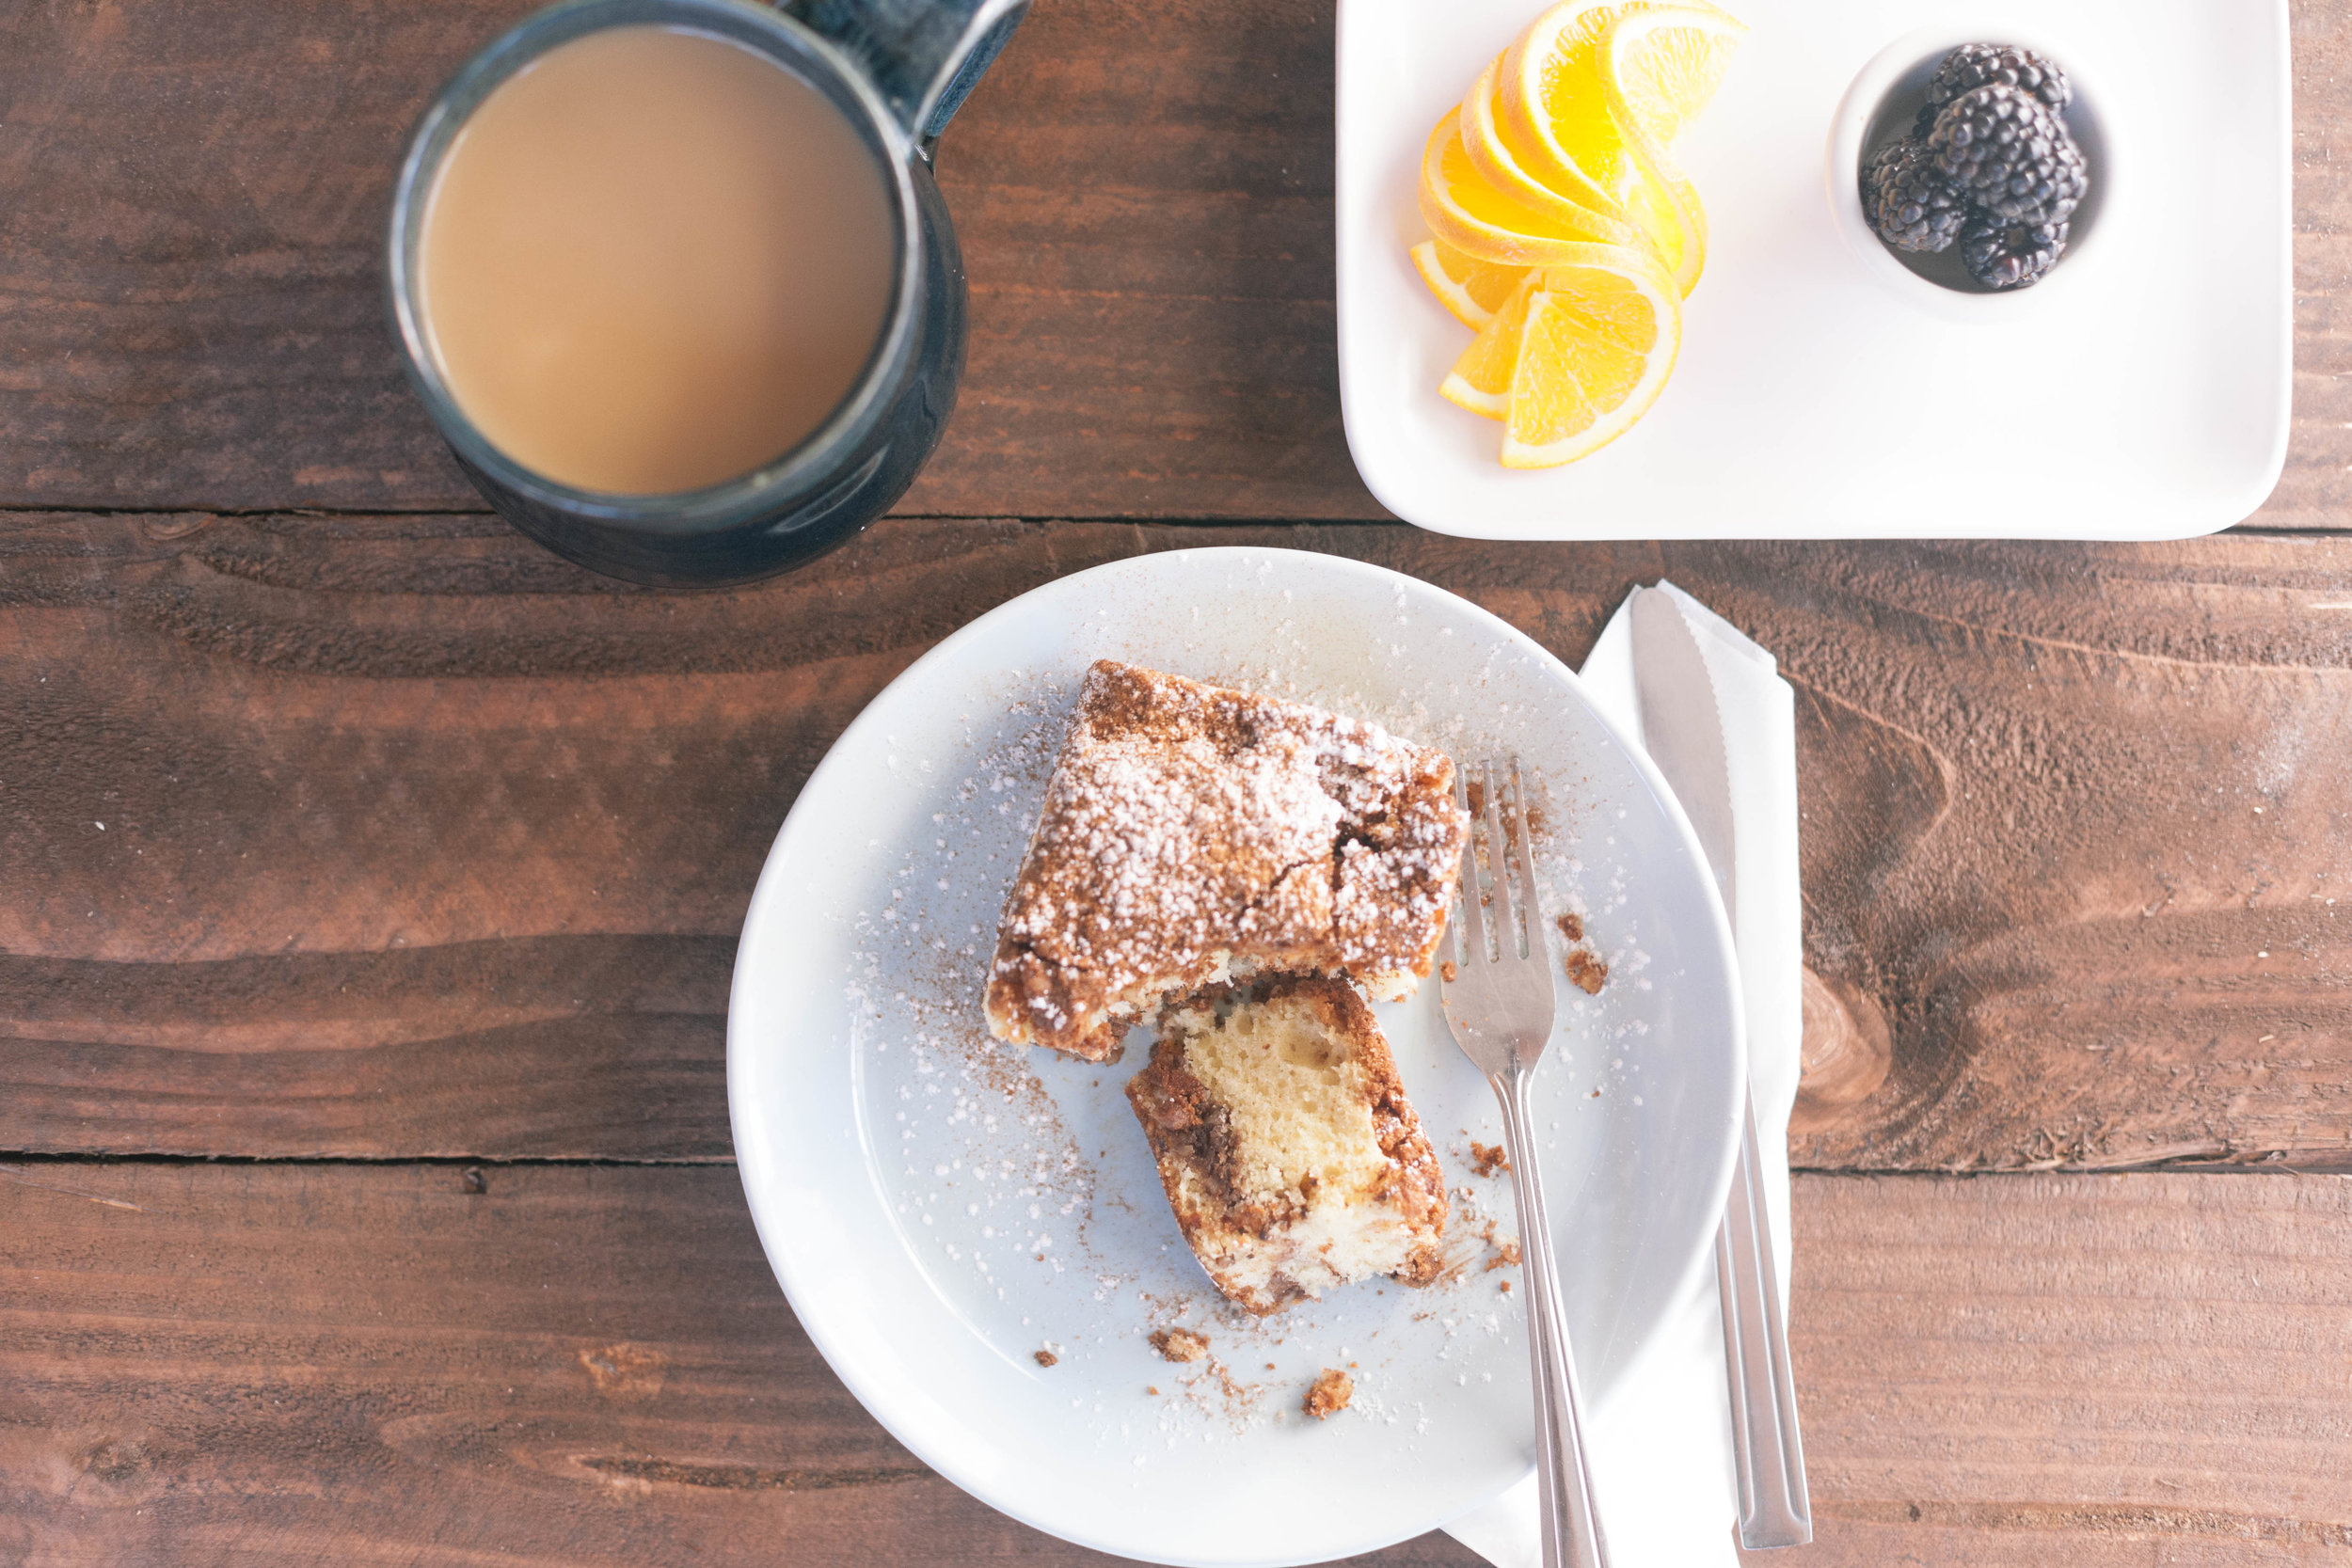 Rainbow Restaurant Coffee Cake Fort Collins Breakfast Brunch Coffee Fruit Old Town.jpg